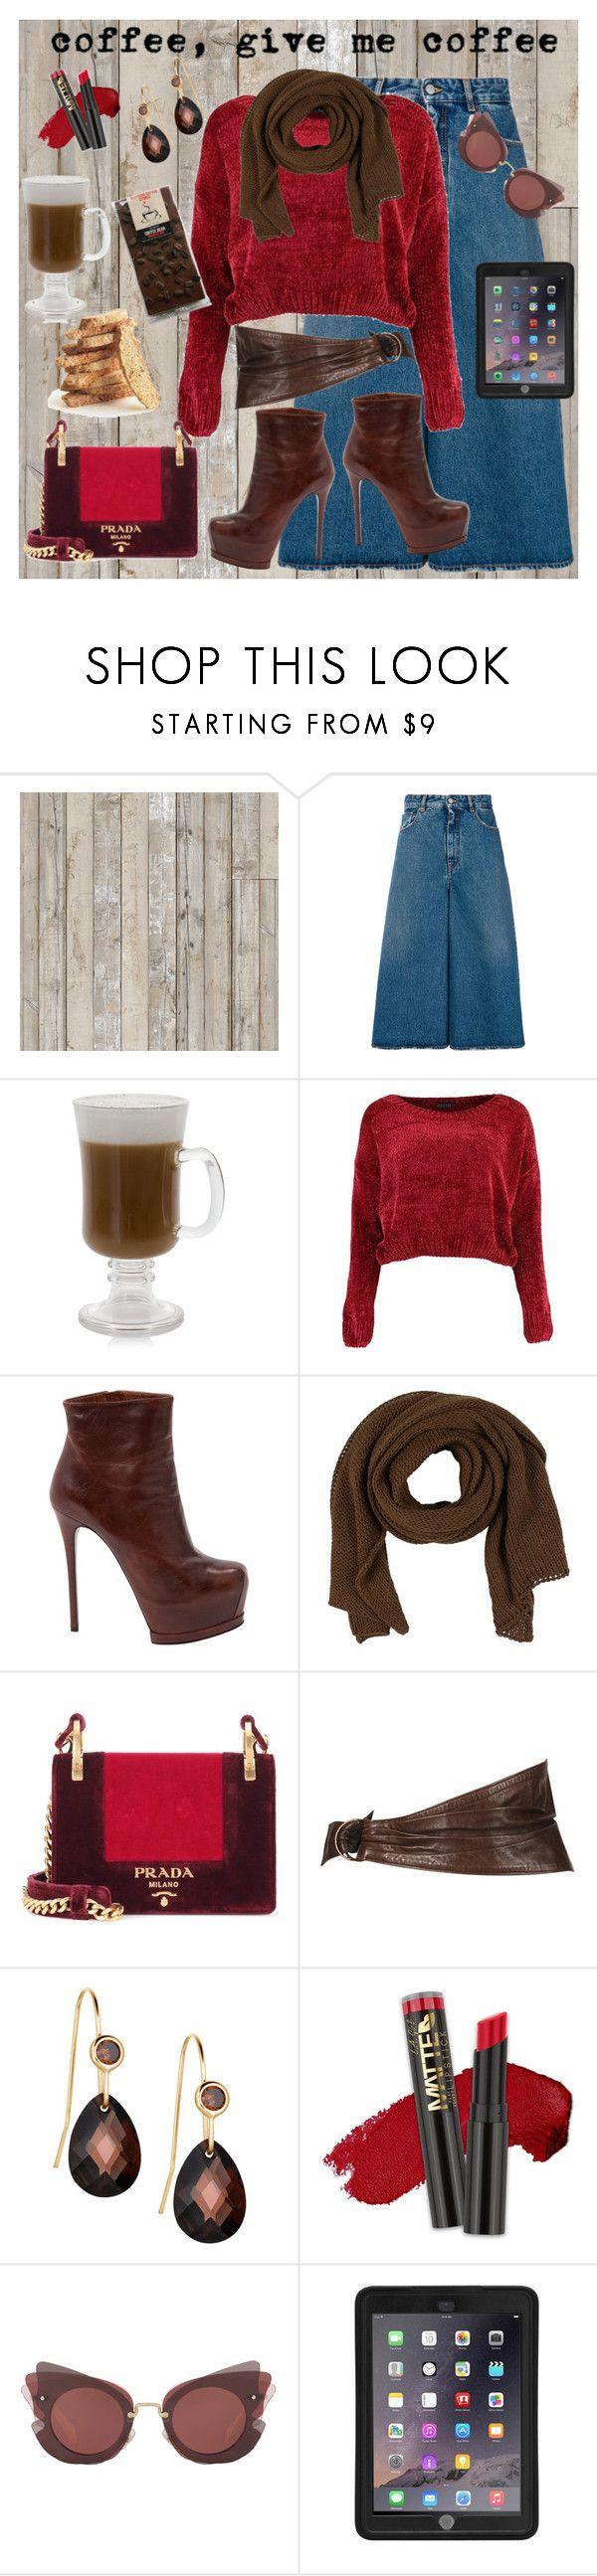 """Coffee Date"" by dobesht ❤ liked on Polyvore featuring NLXL, MM6 Maison Margiela, Boohoo, Gianmarco Lorenzi, ISABEL BENENATO, Prada, Alaïa, L.A. Girl, Miu Miu and Griffin"